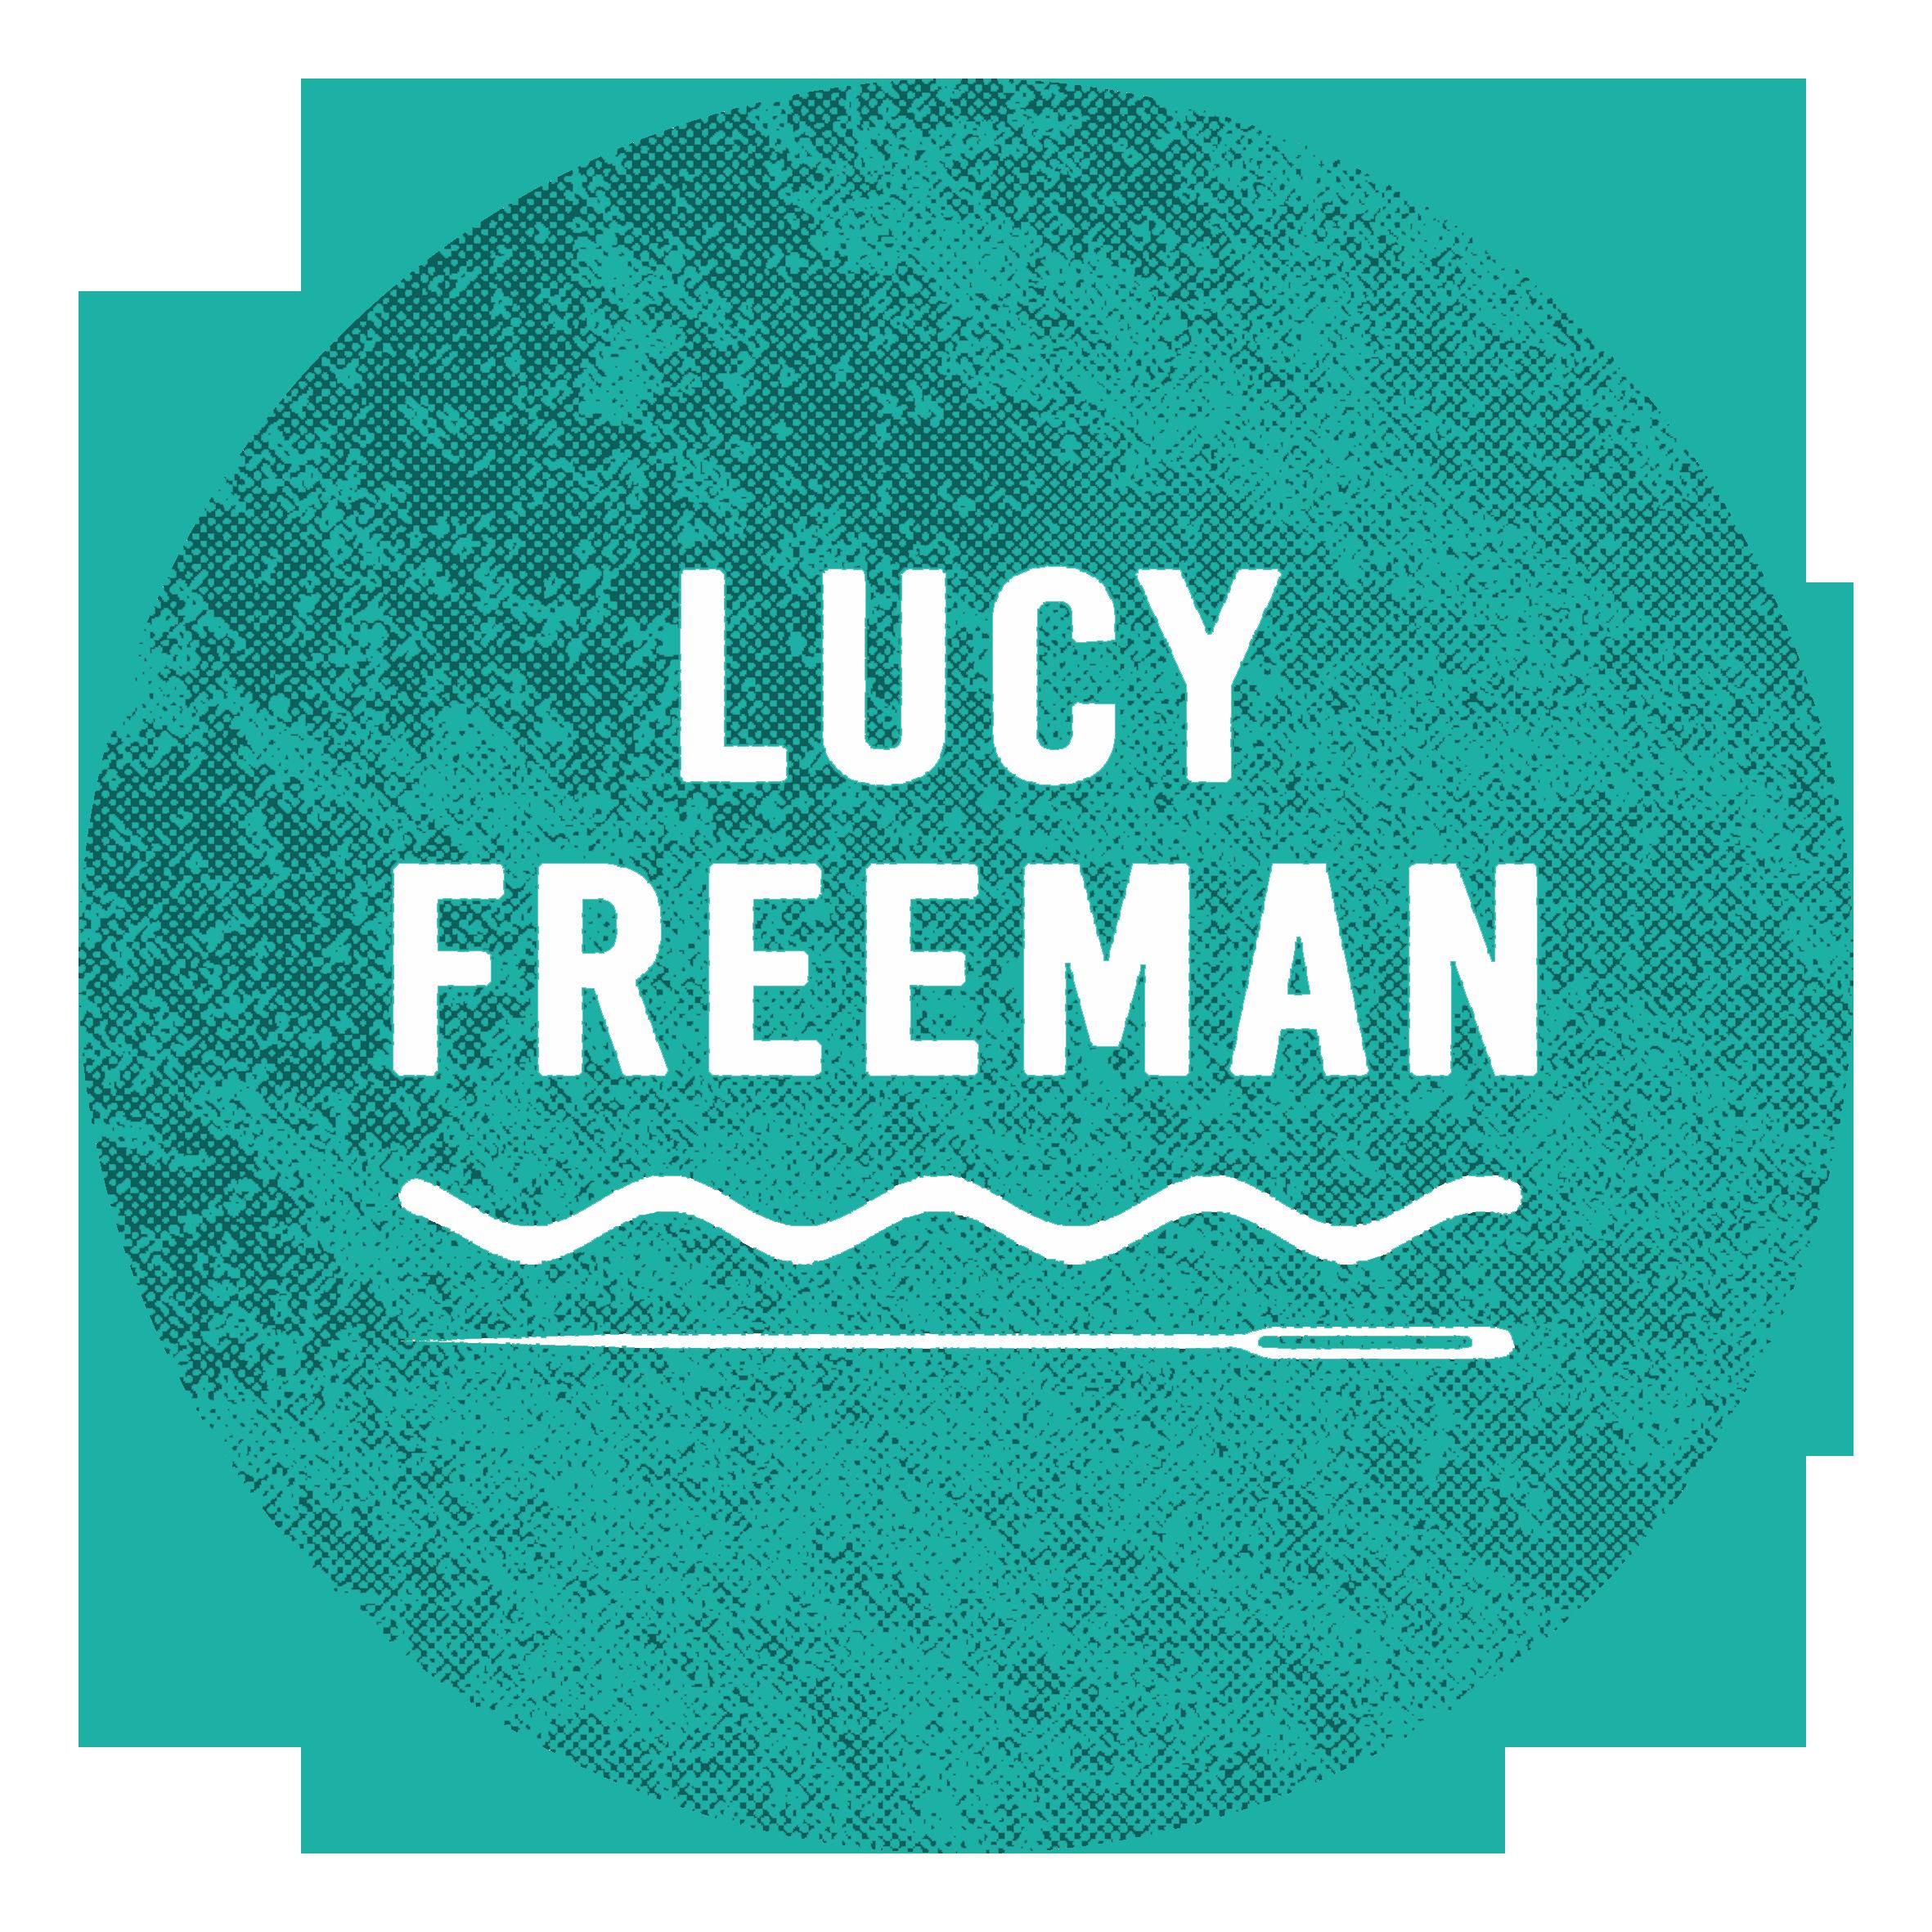 Lucy Freeman